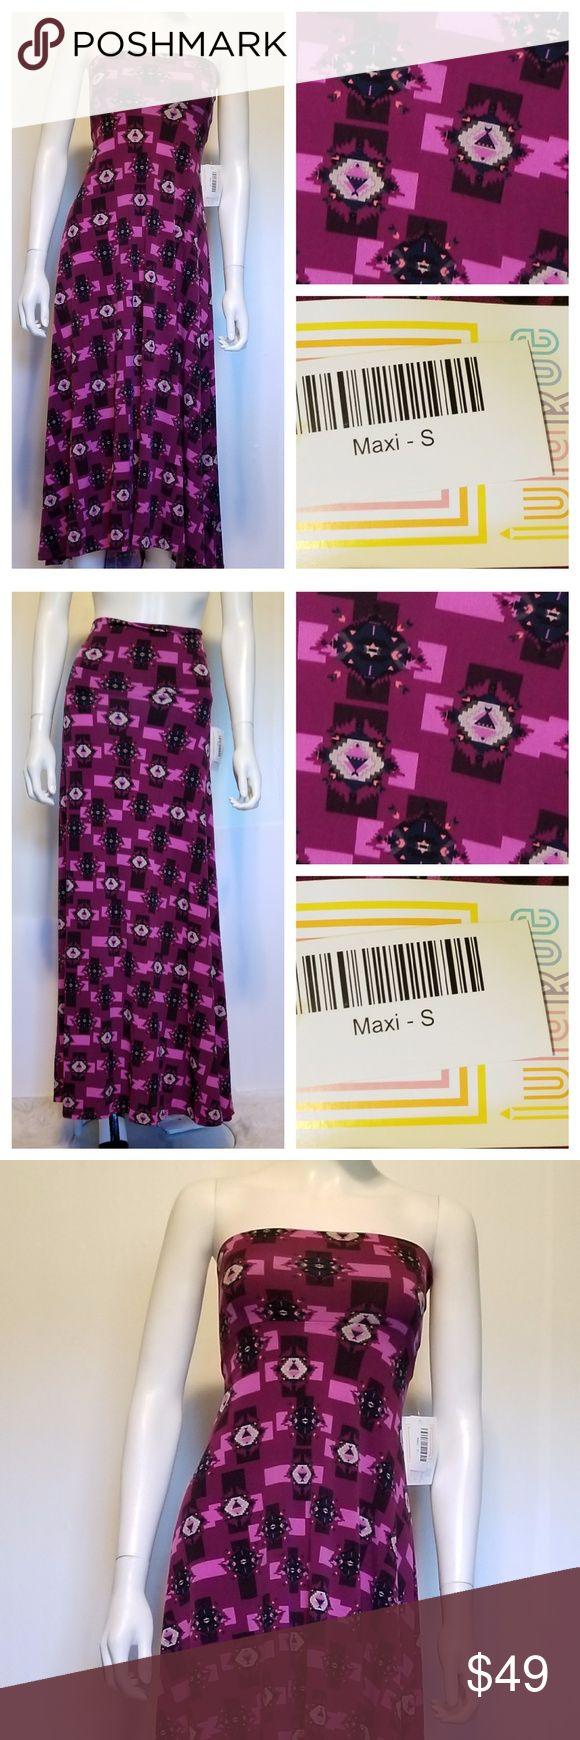 LULAROE MaxiPurple Aztec Pattern UNICORN  NWT Unicorn Purple Aztec Maxi Skirt in Small  Can be worn as a maxi skirt.......midi skirt and a strapless dress LuLaRoe Skirts Maxi